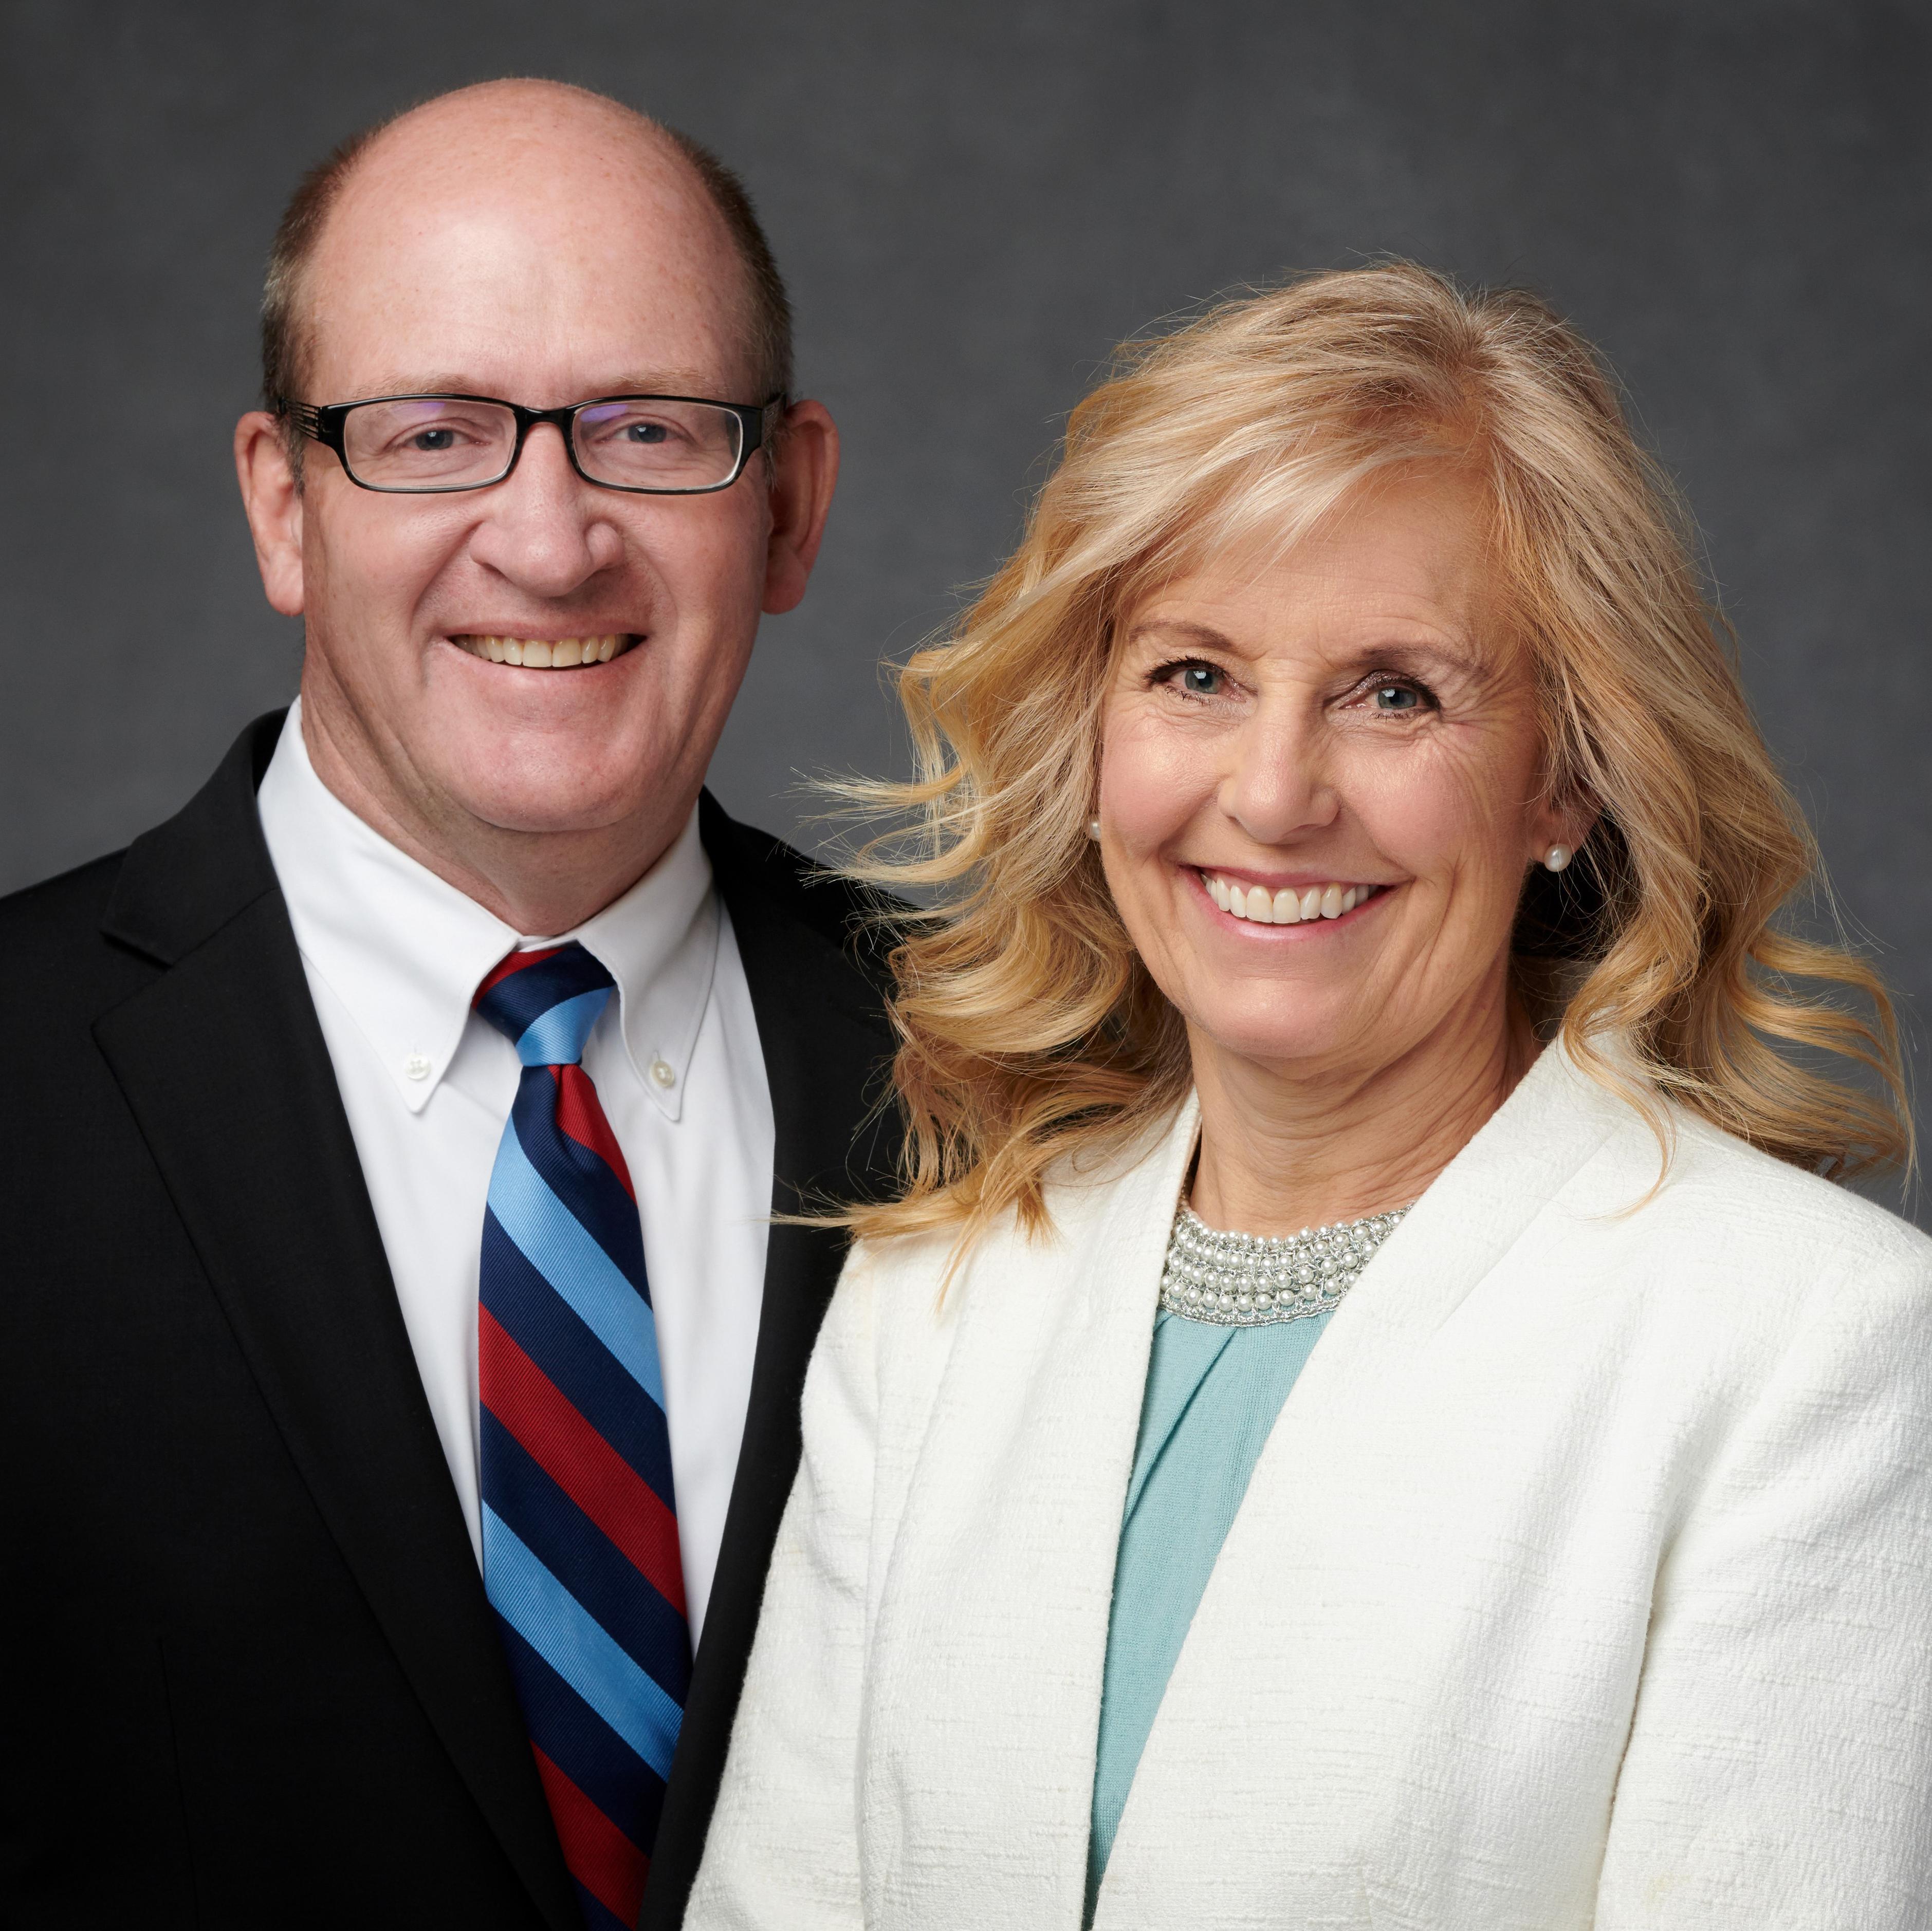 Scott and Lori L. Featherstone